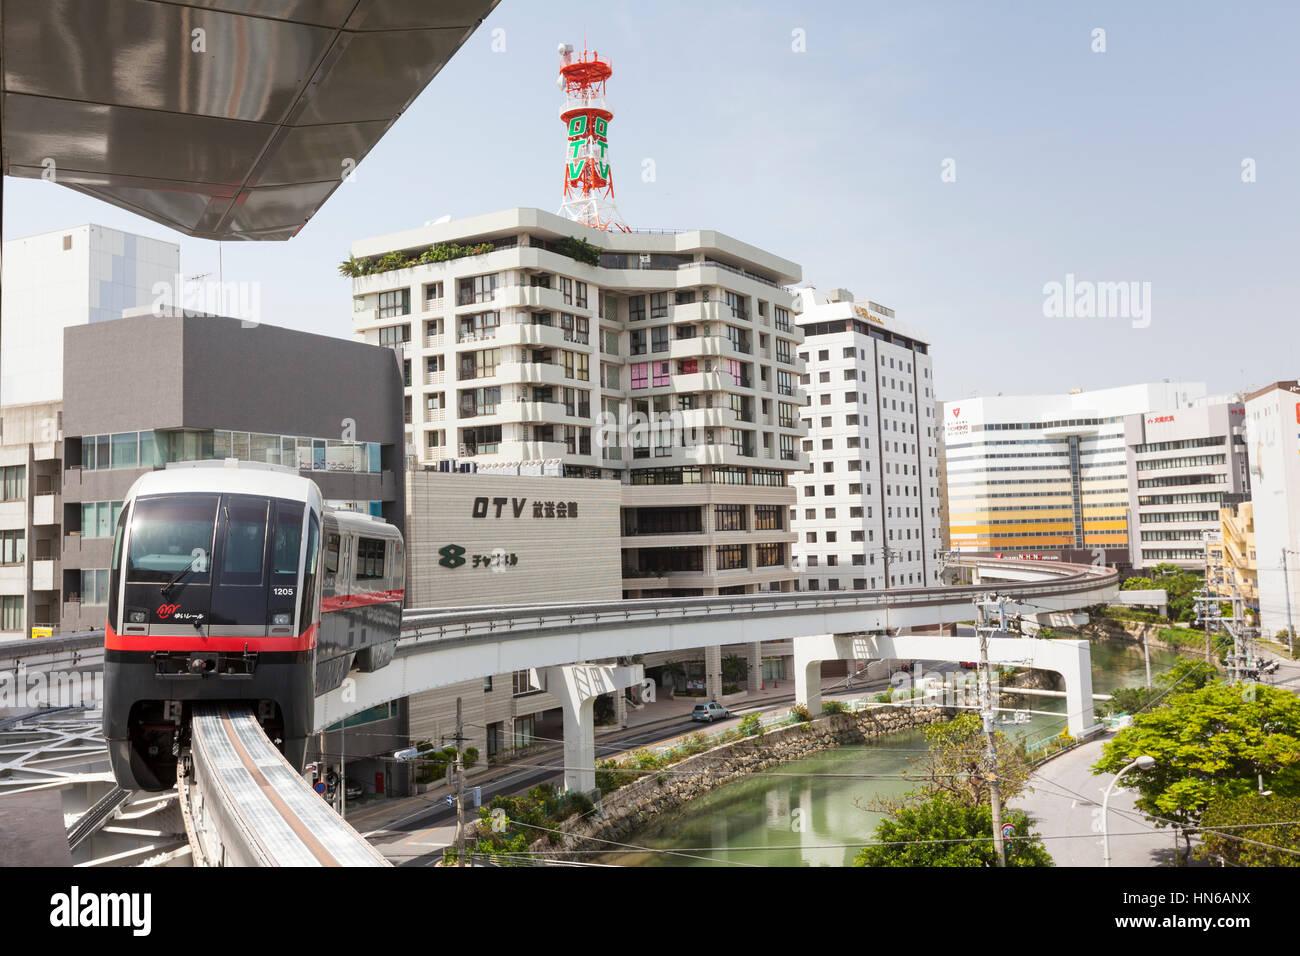 NAHA, JAPAN - APRIL 1: A train snakes past modern buildings on the Okinawa City Monorail line in Naha, Okinawa Island, - Stock Image